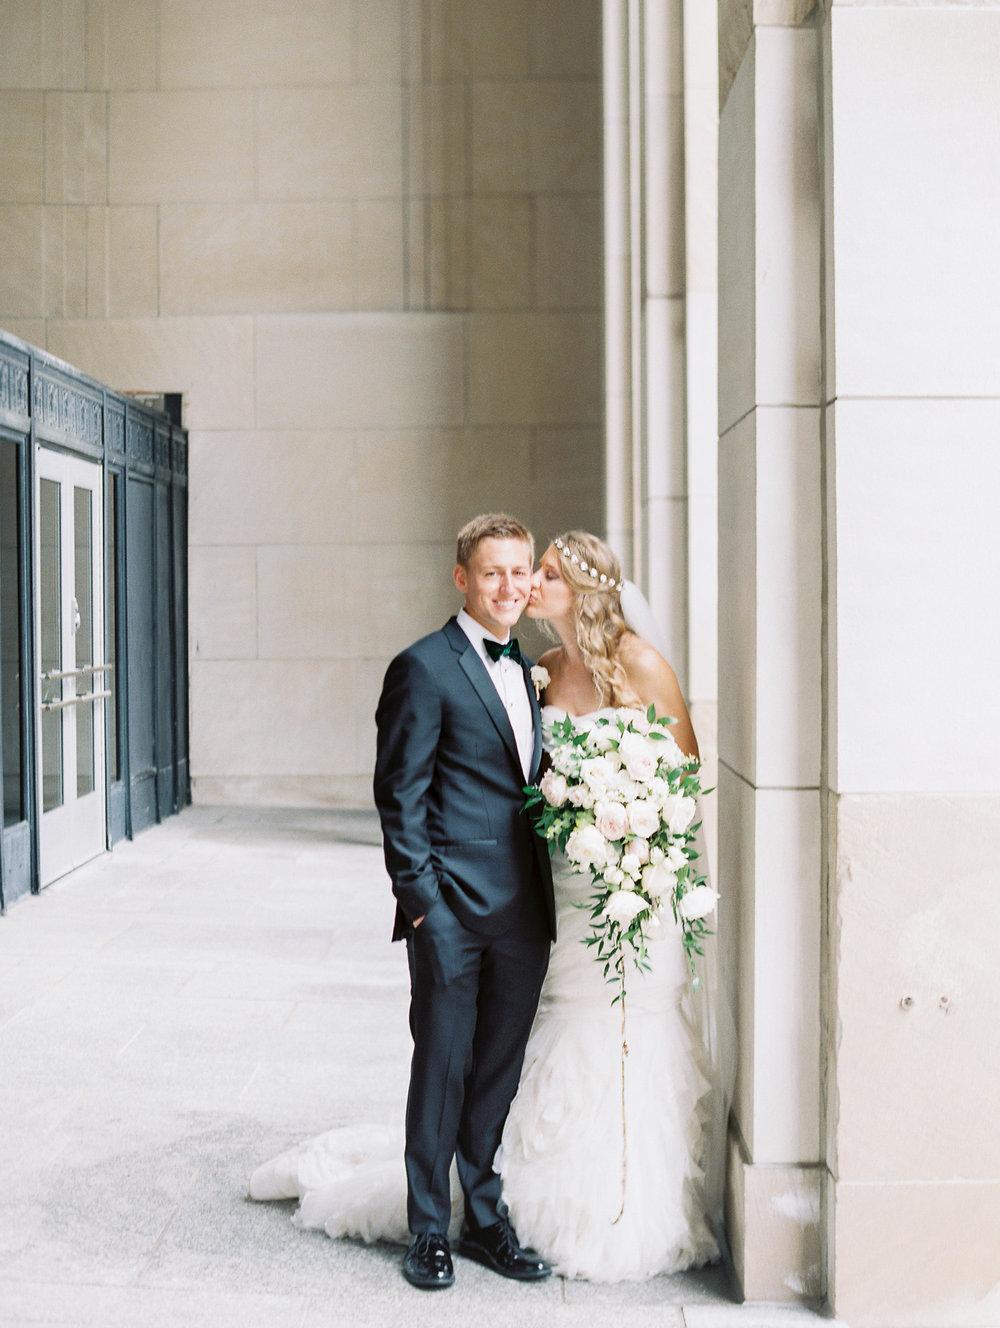 Zawisza Wedding f ASP©-34.jpg